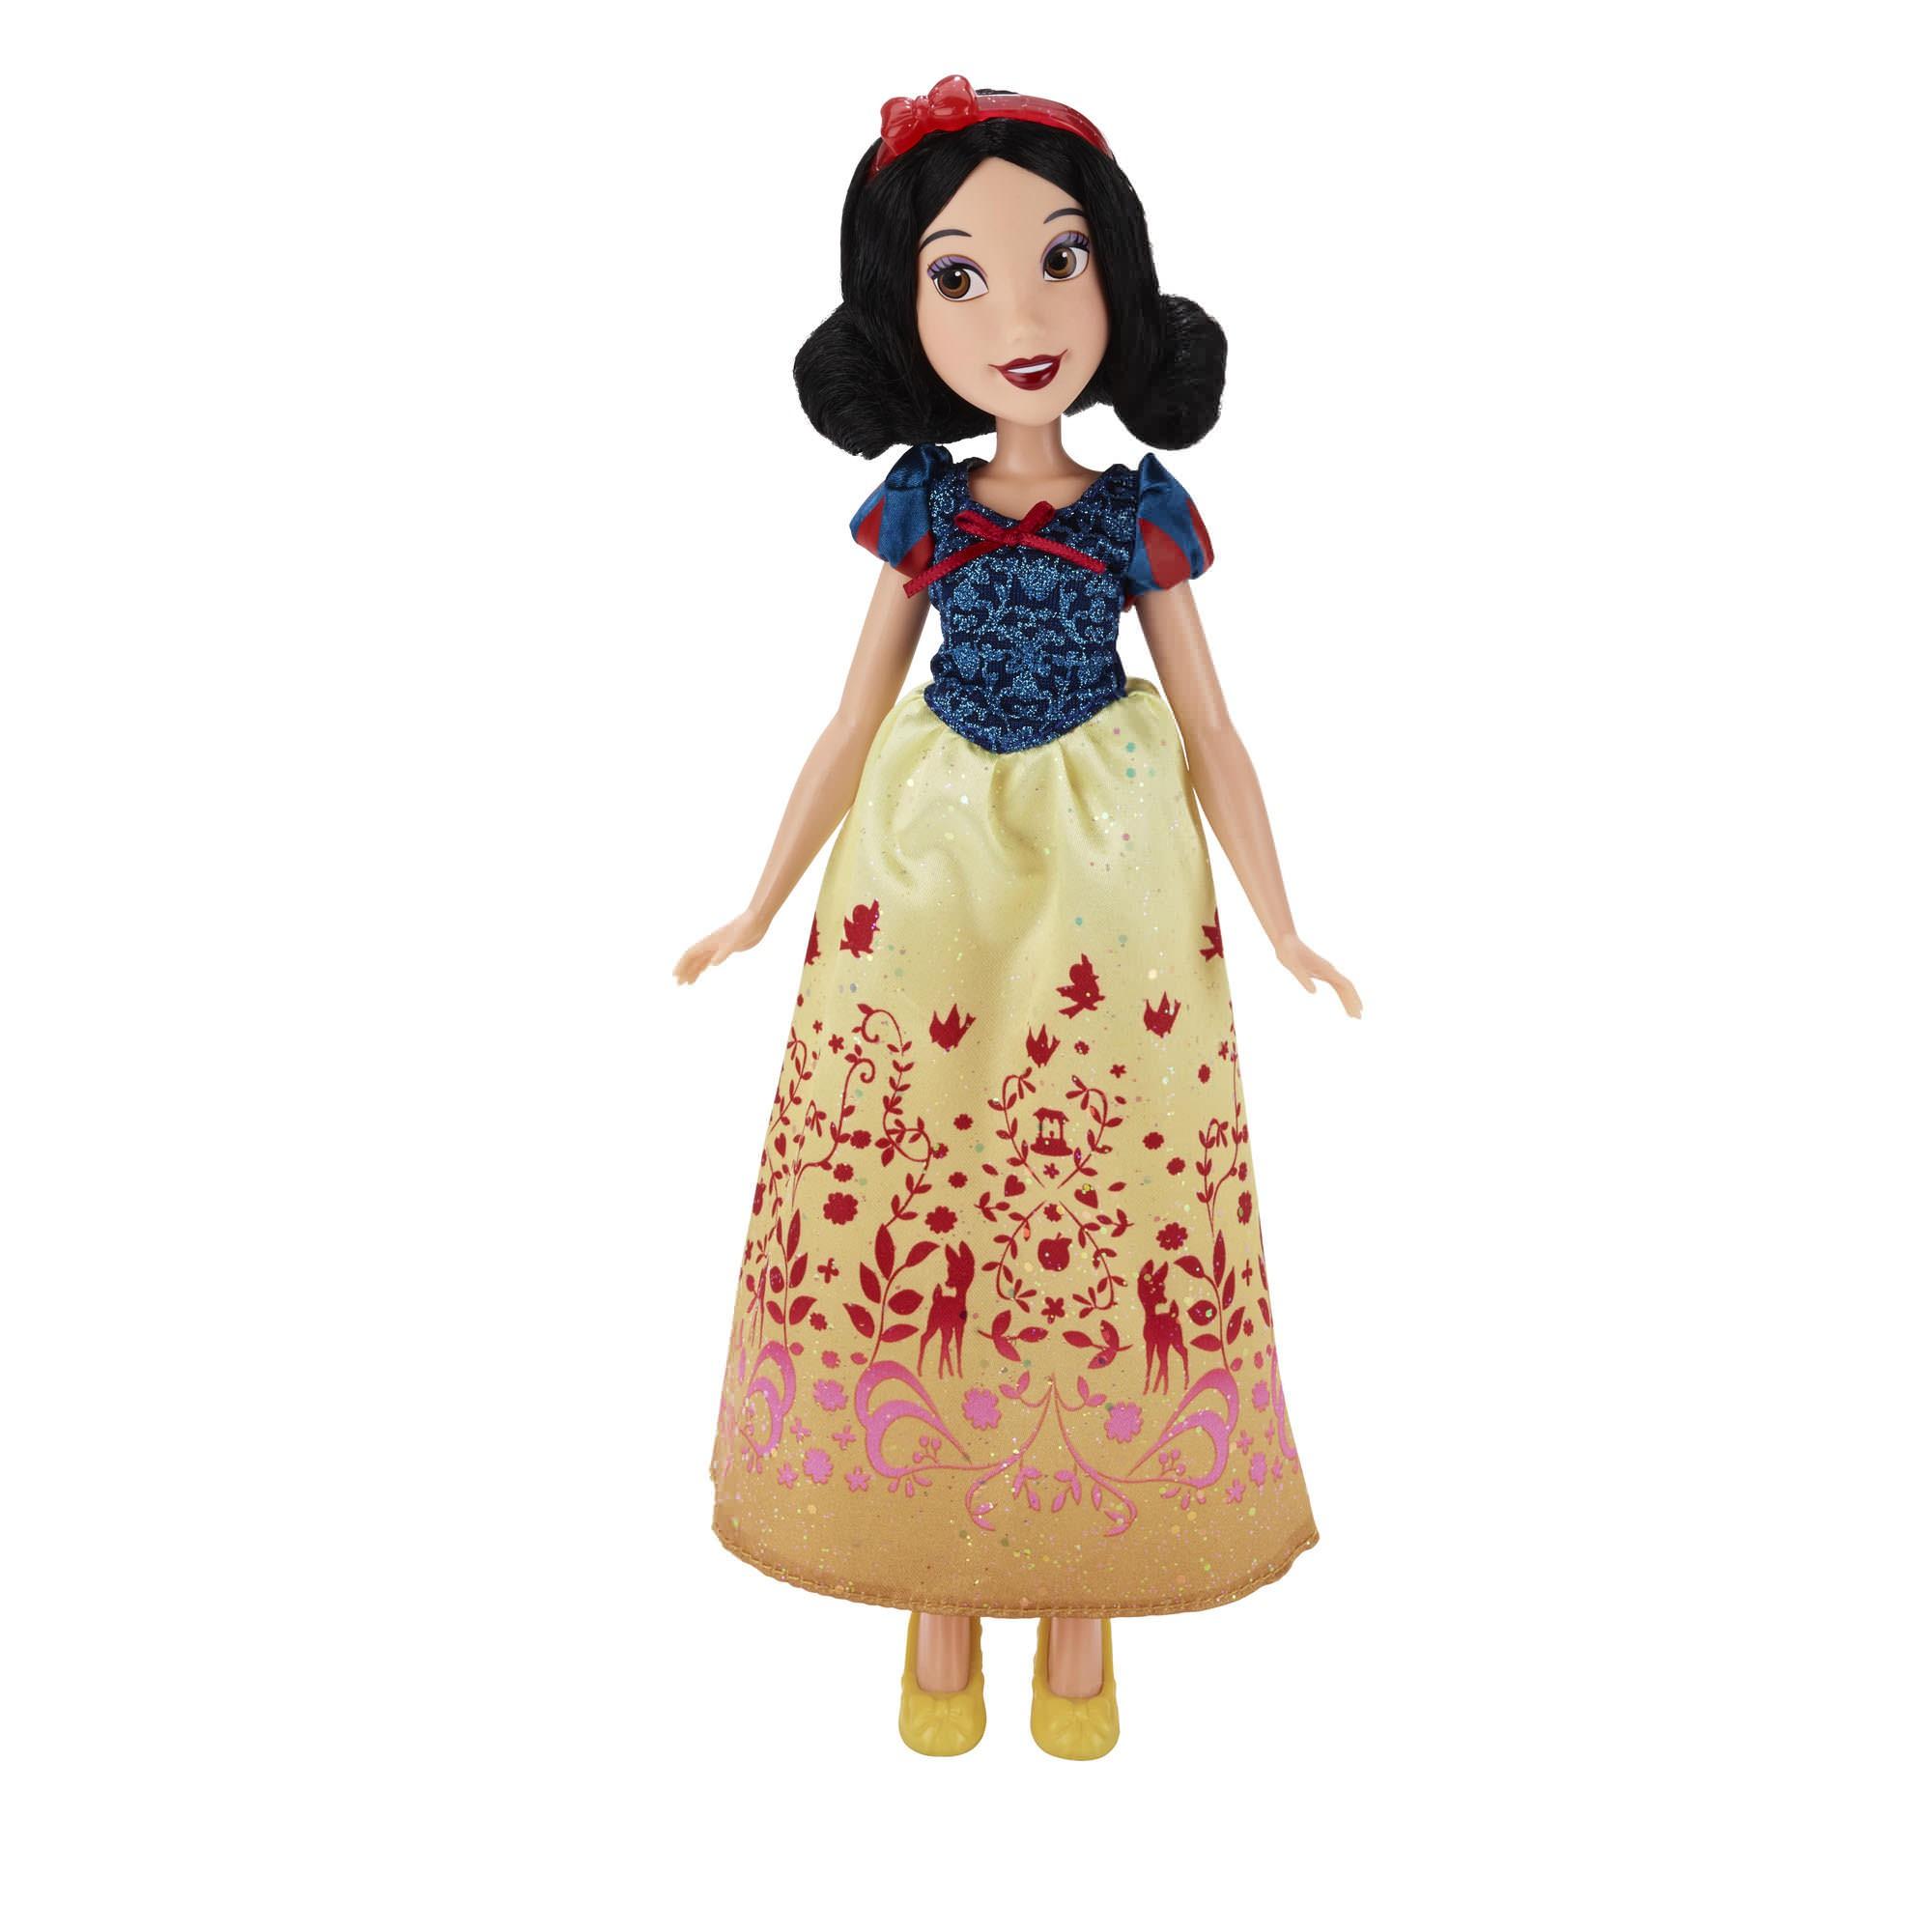 Boneca Princesa Clássica Branca De Neve B5289 Hasbro